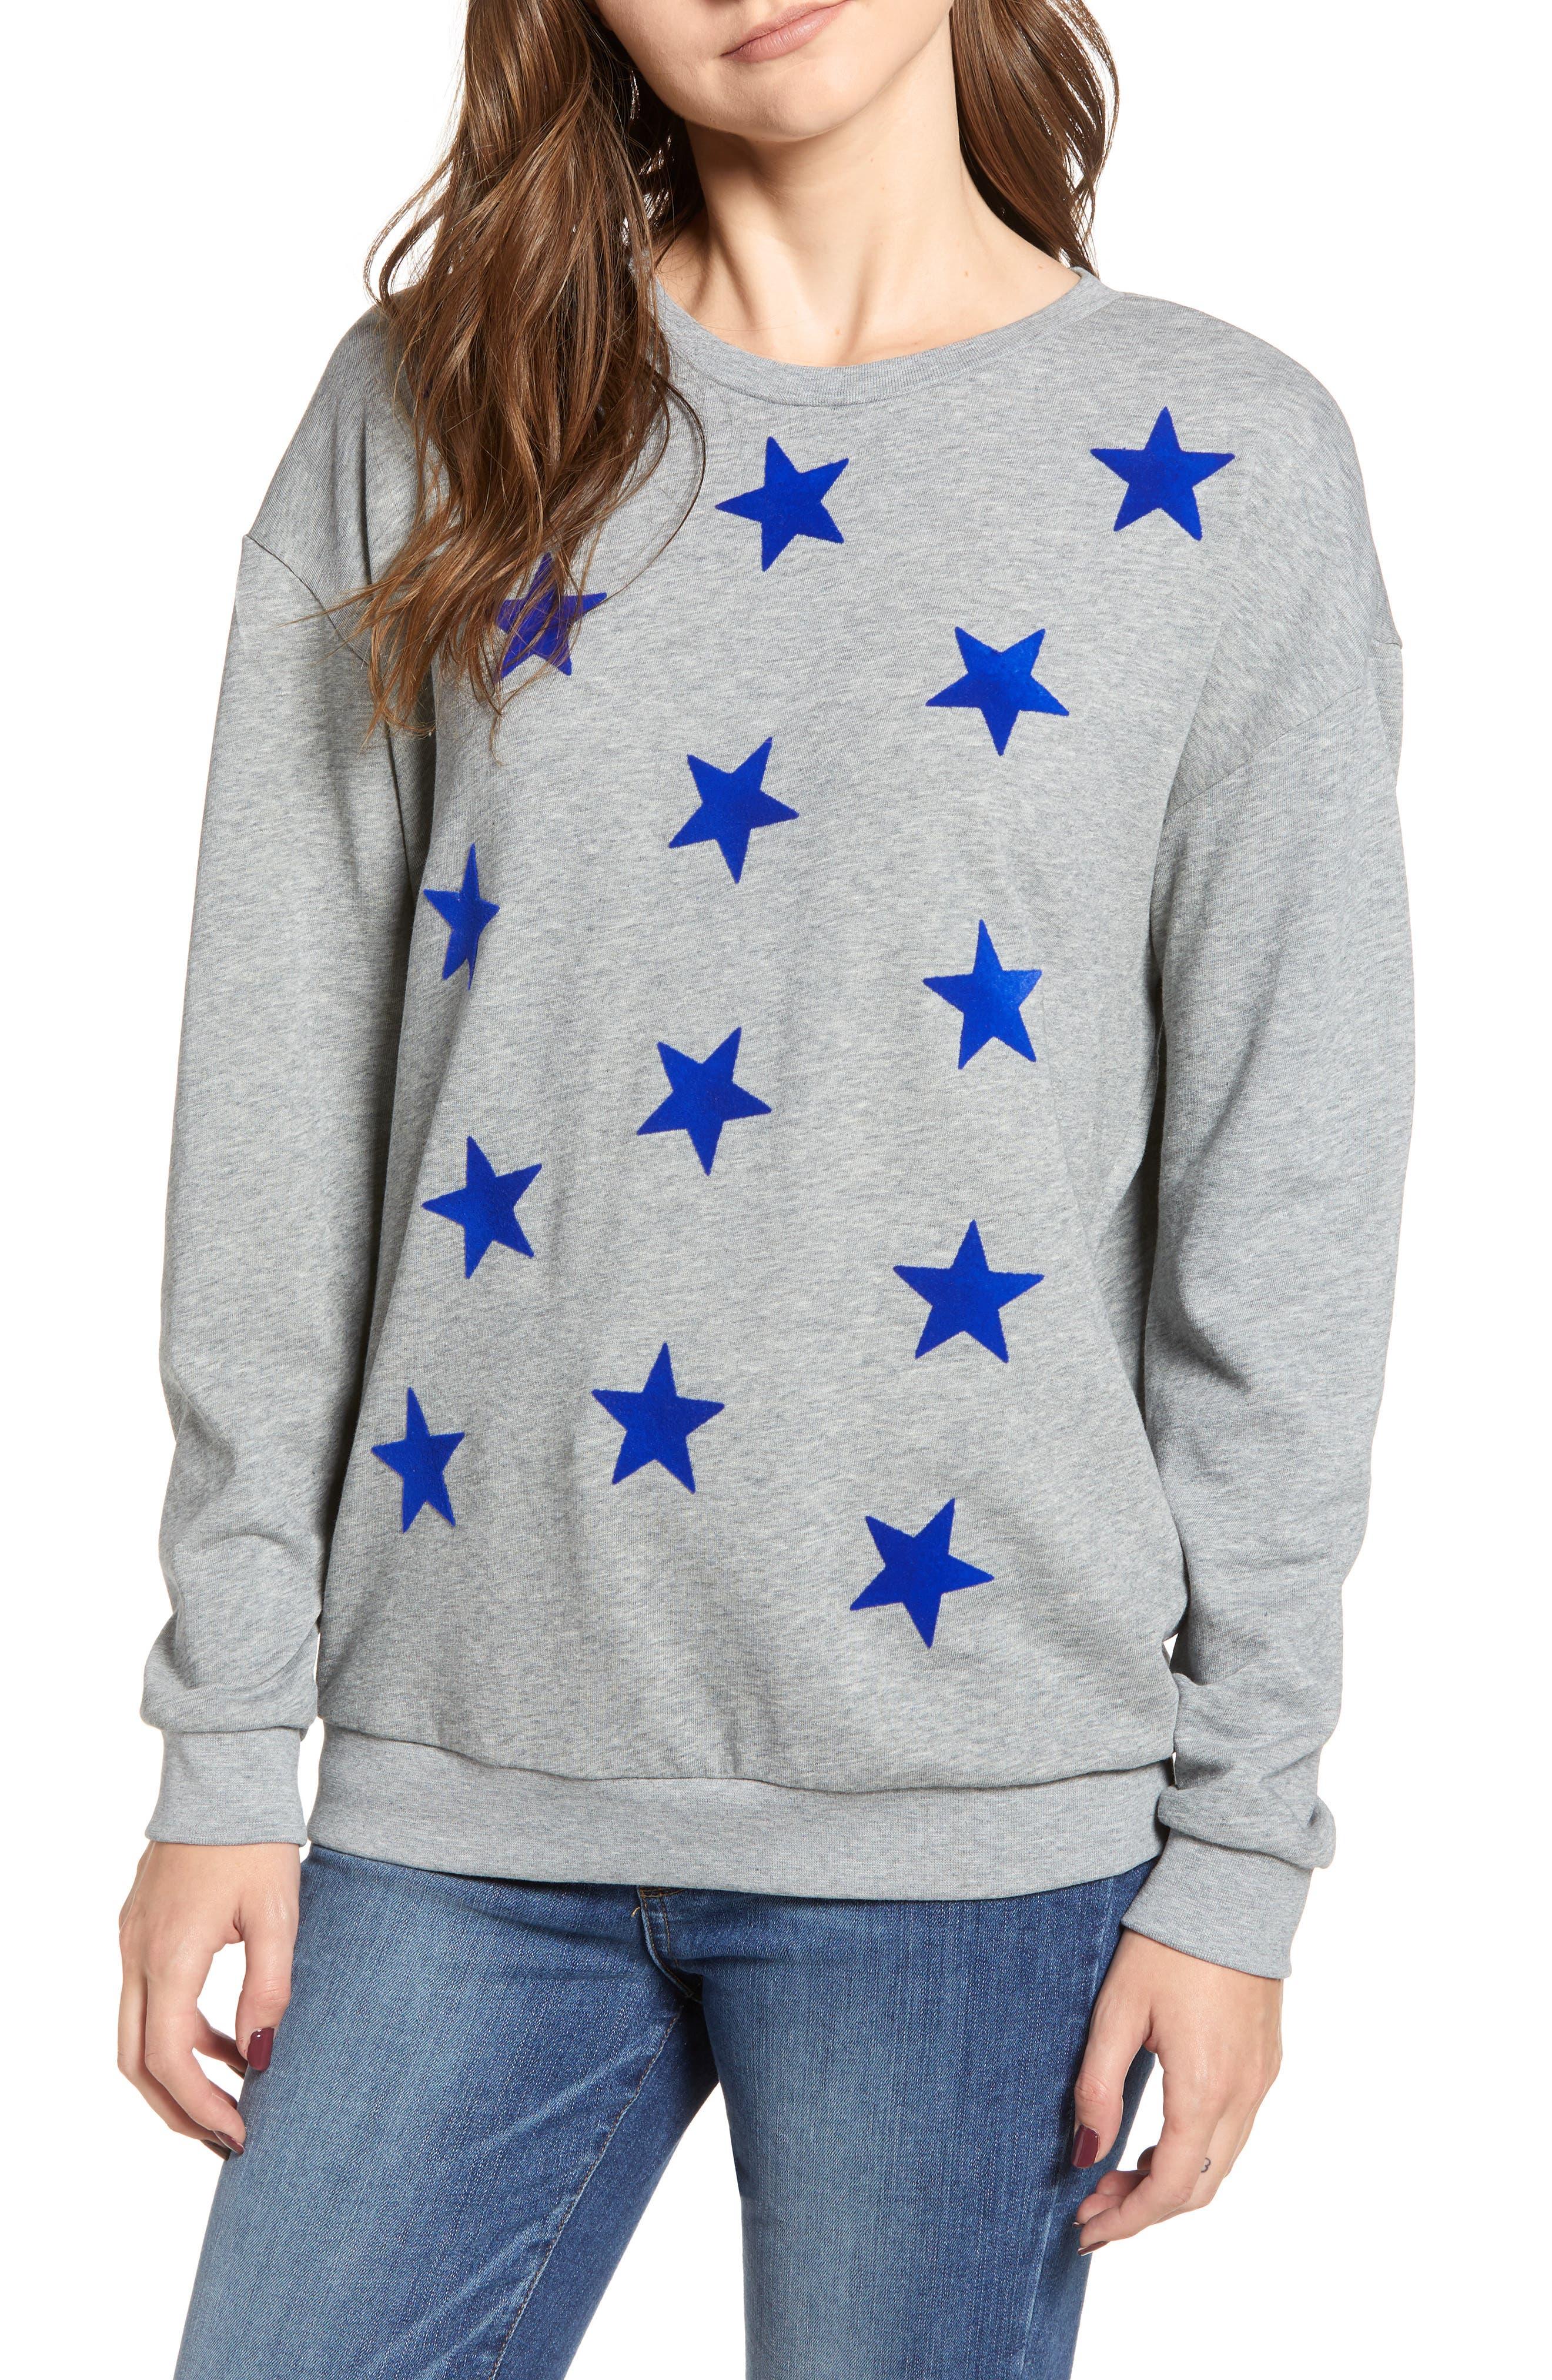 Alexa Stars Sweatshirt,                             Main thumbnail 1, color,                             GREY